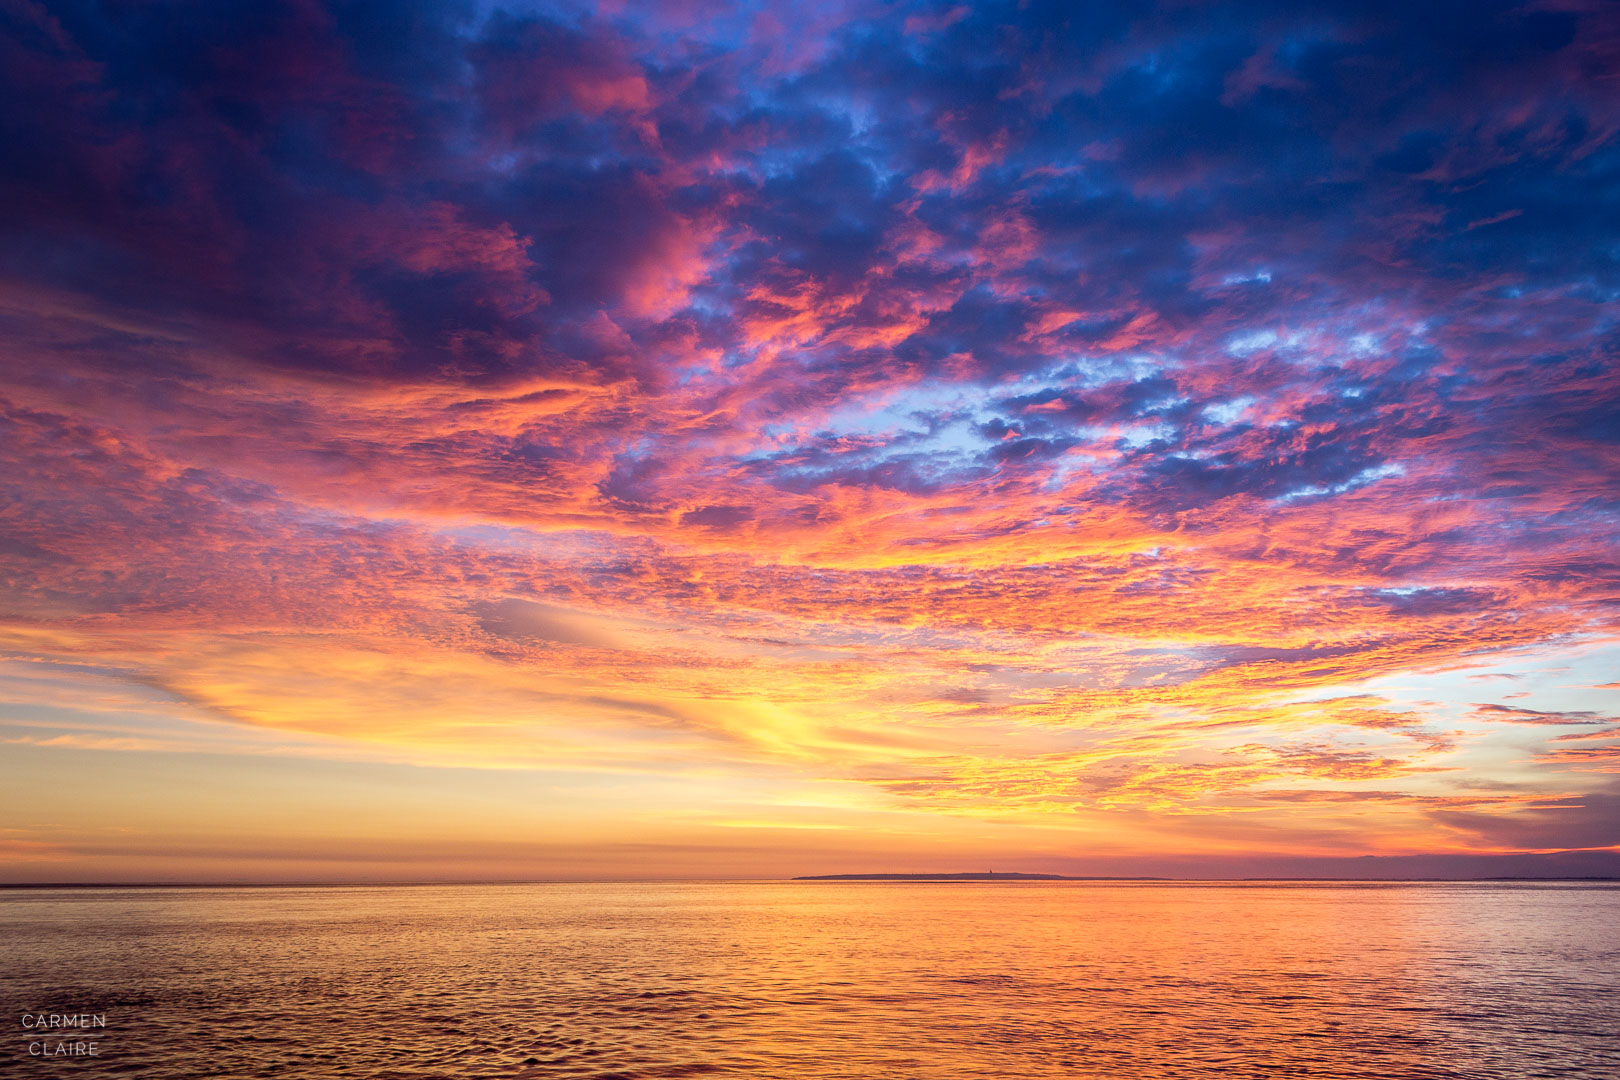 2018-09-23 Bali Nusa Sunset.jpg